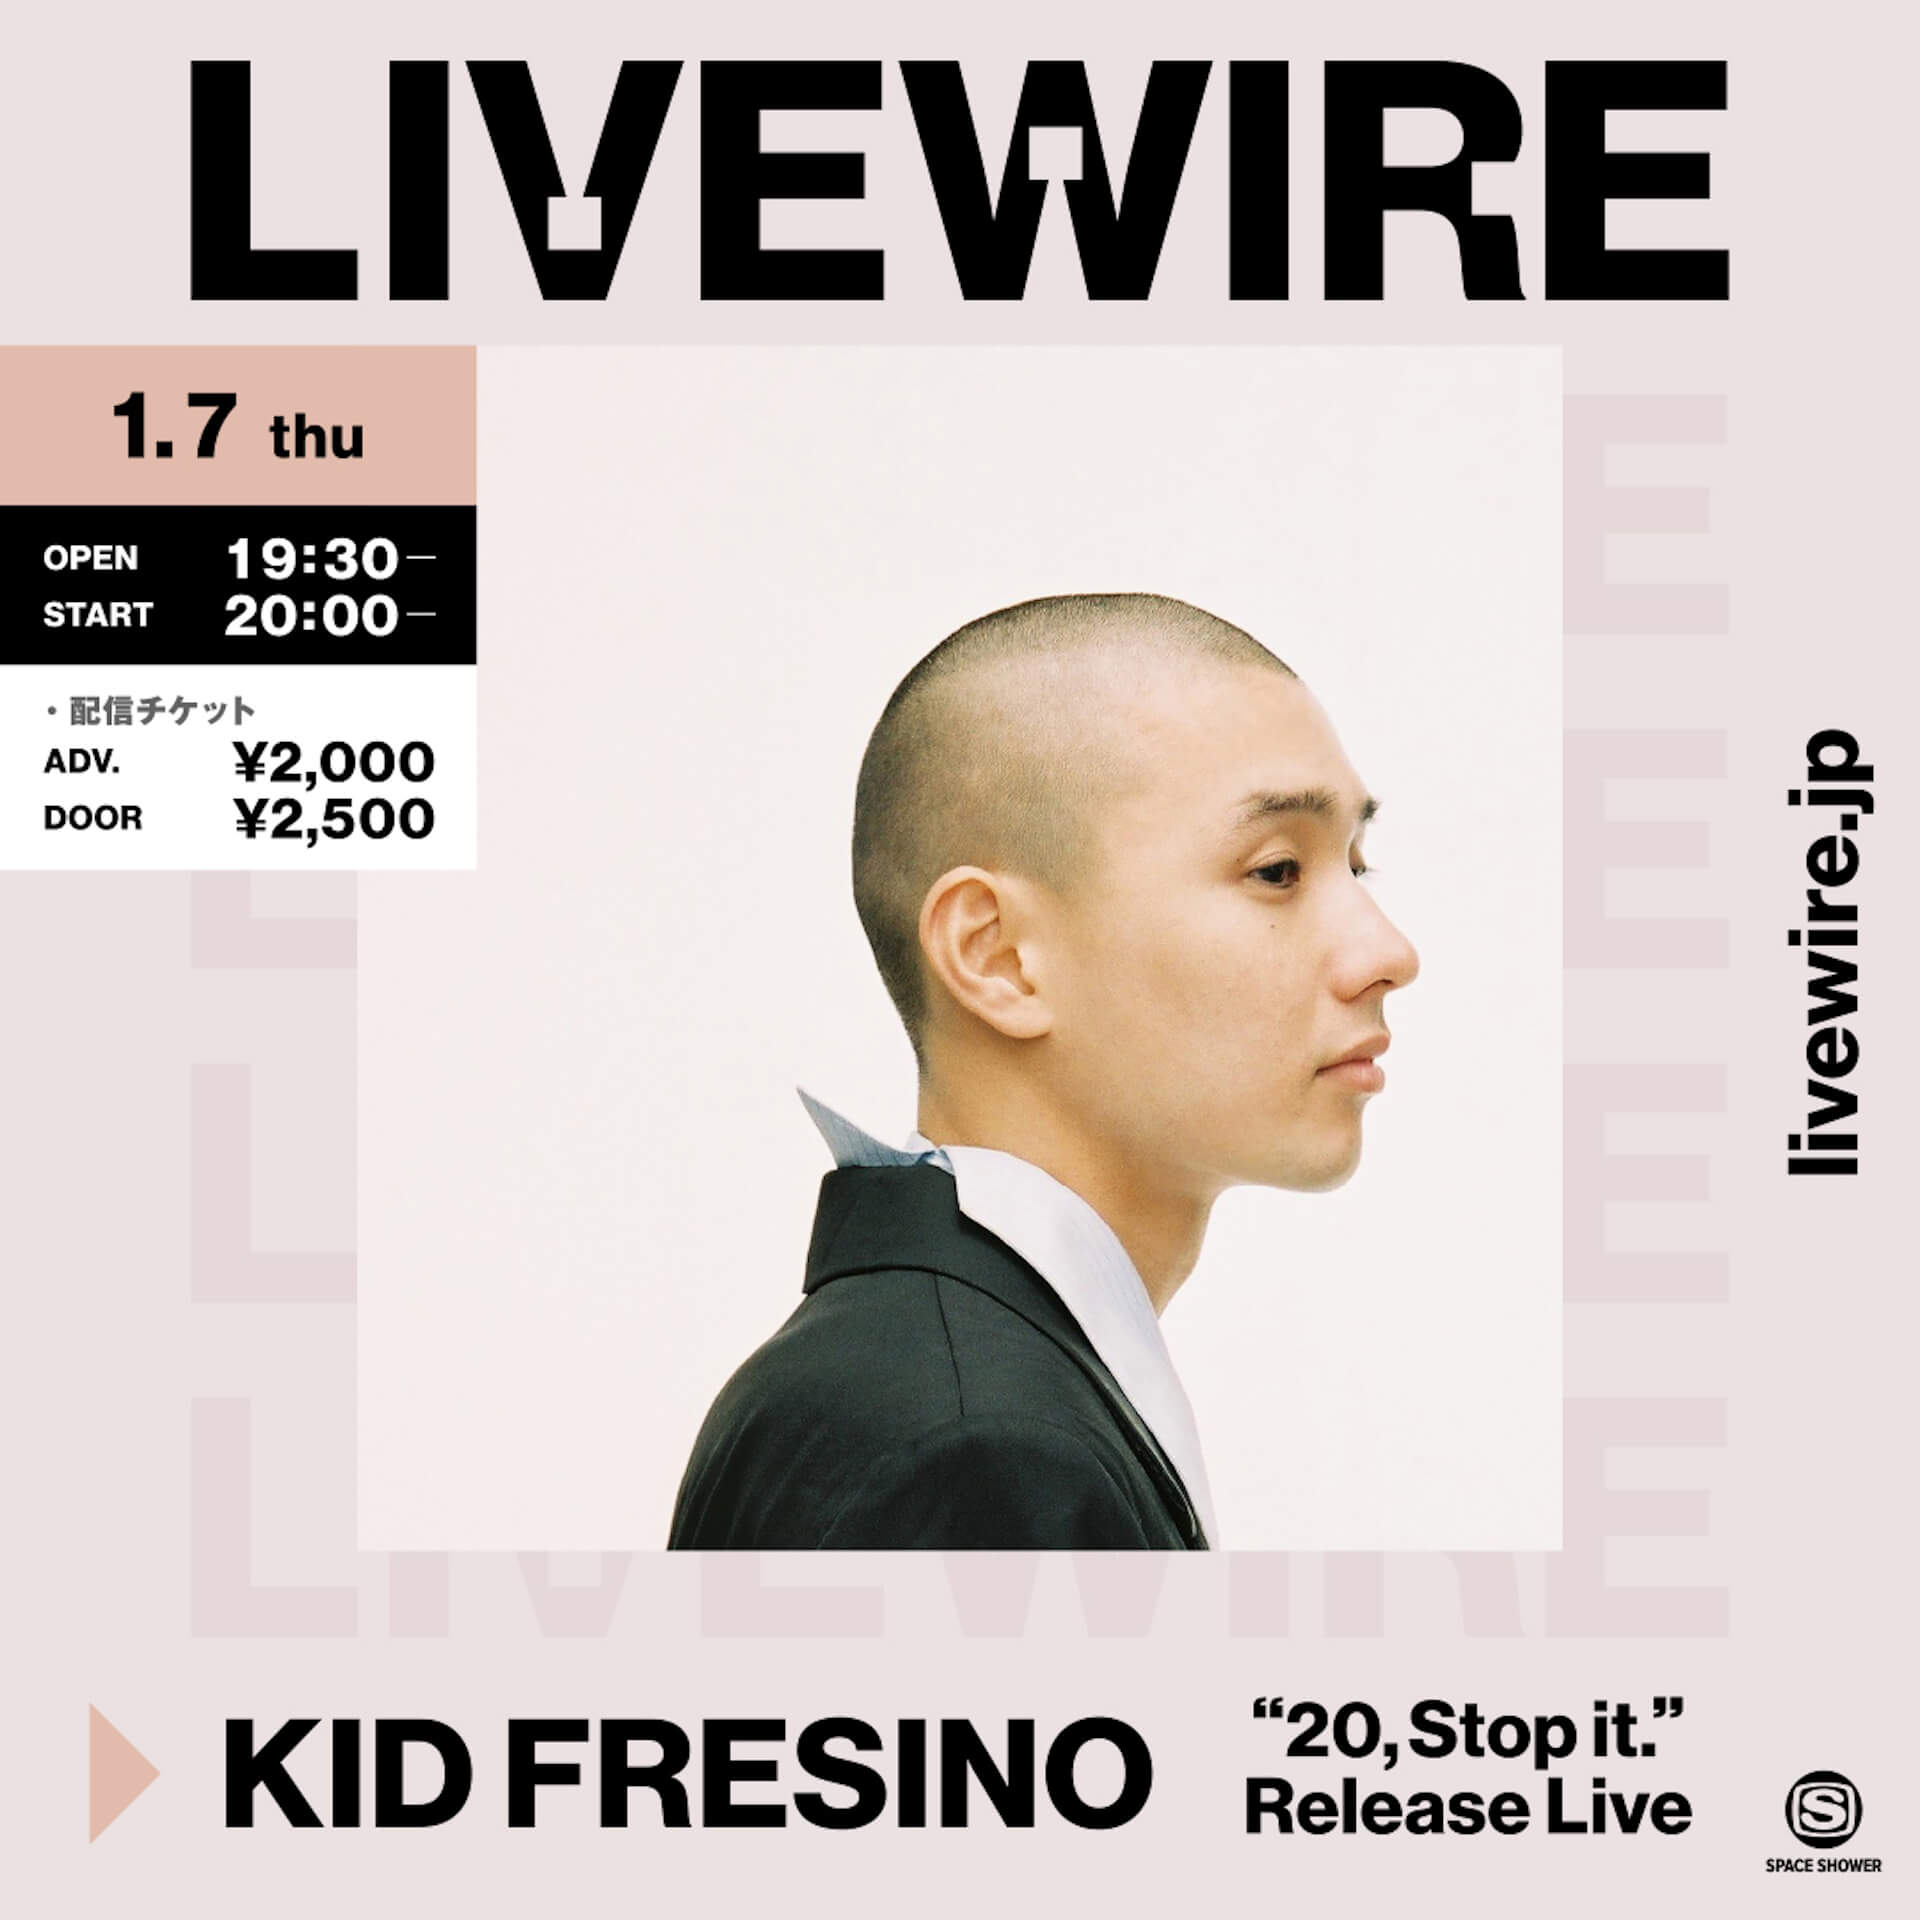 KID FRESINO最新アルバム『20,Stop it.』が本日リリース|客演にCampanella、JAGGLA、長谷川白紙、BIM&プロデュースにobject blueも music210106_kidfresino_1